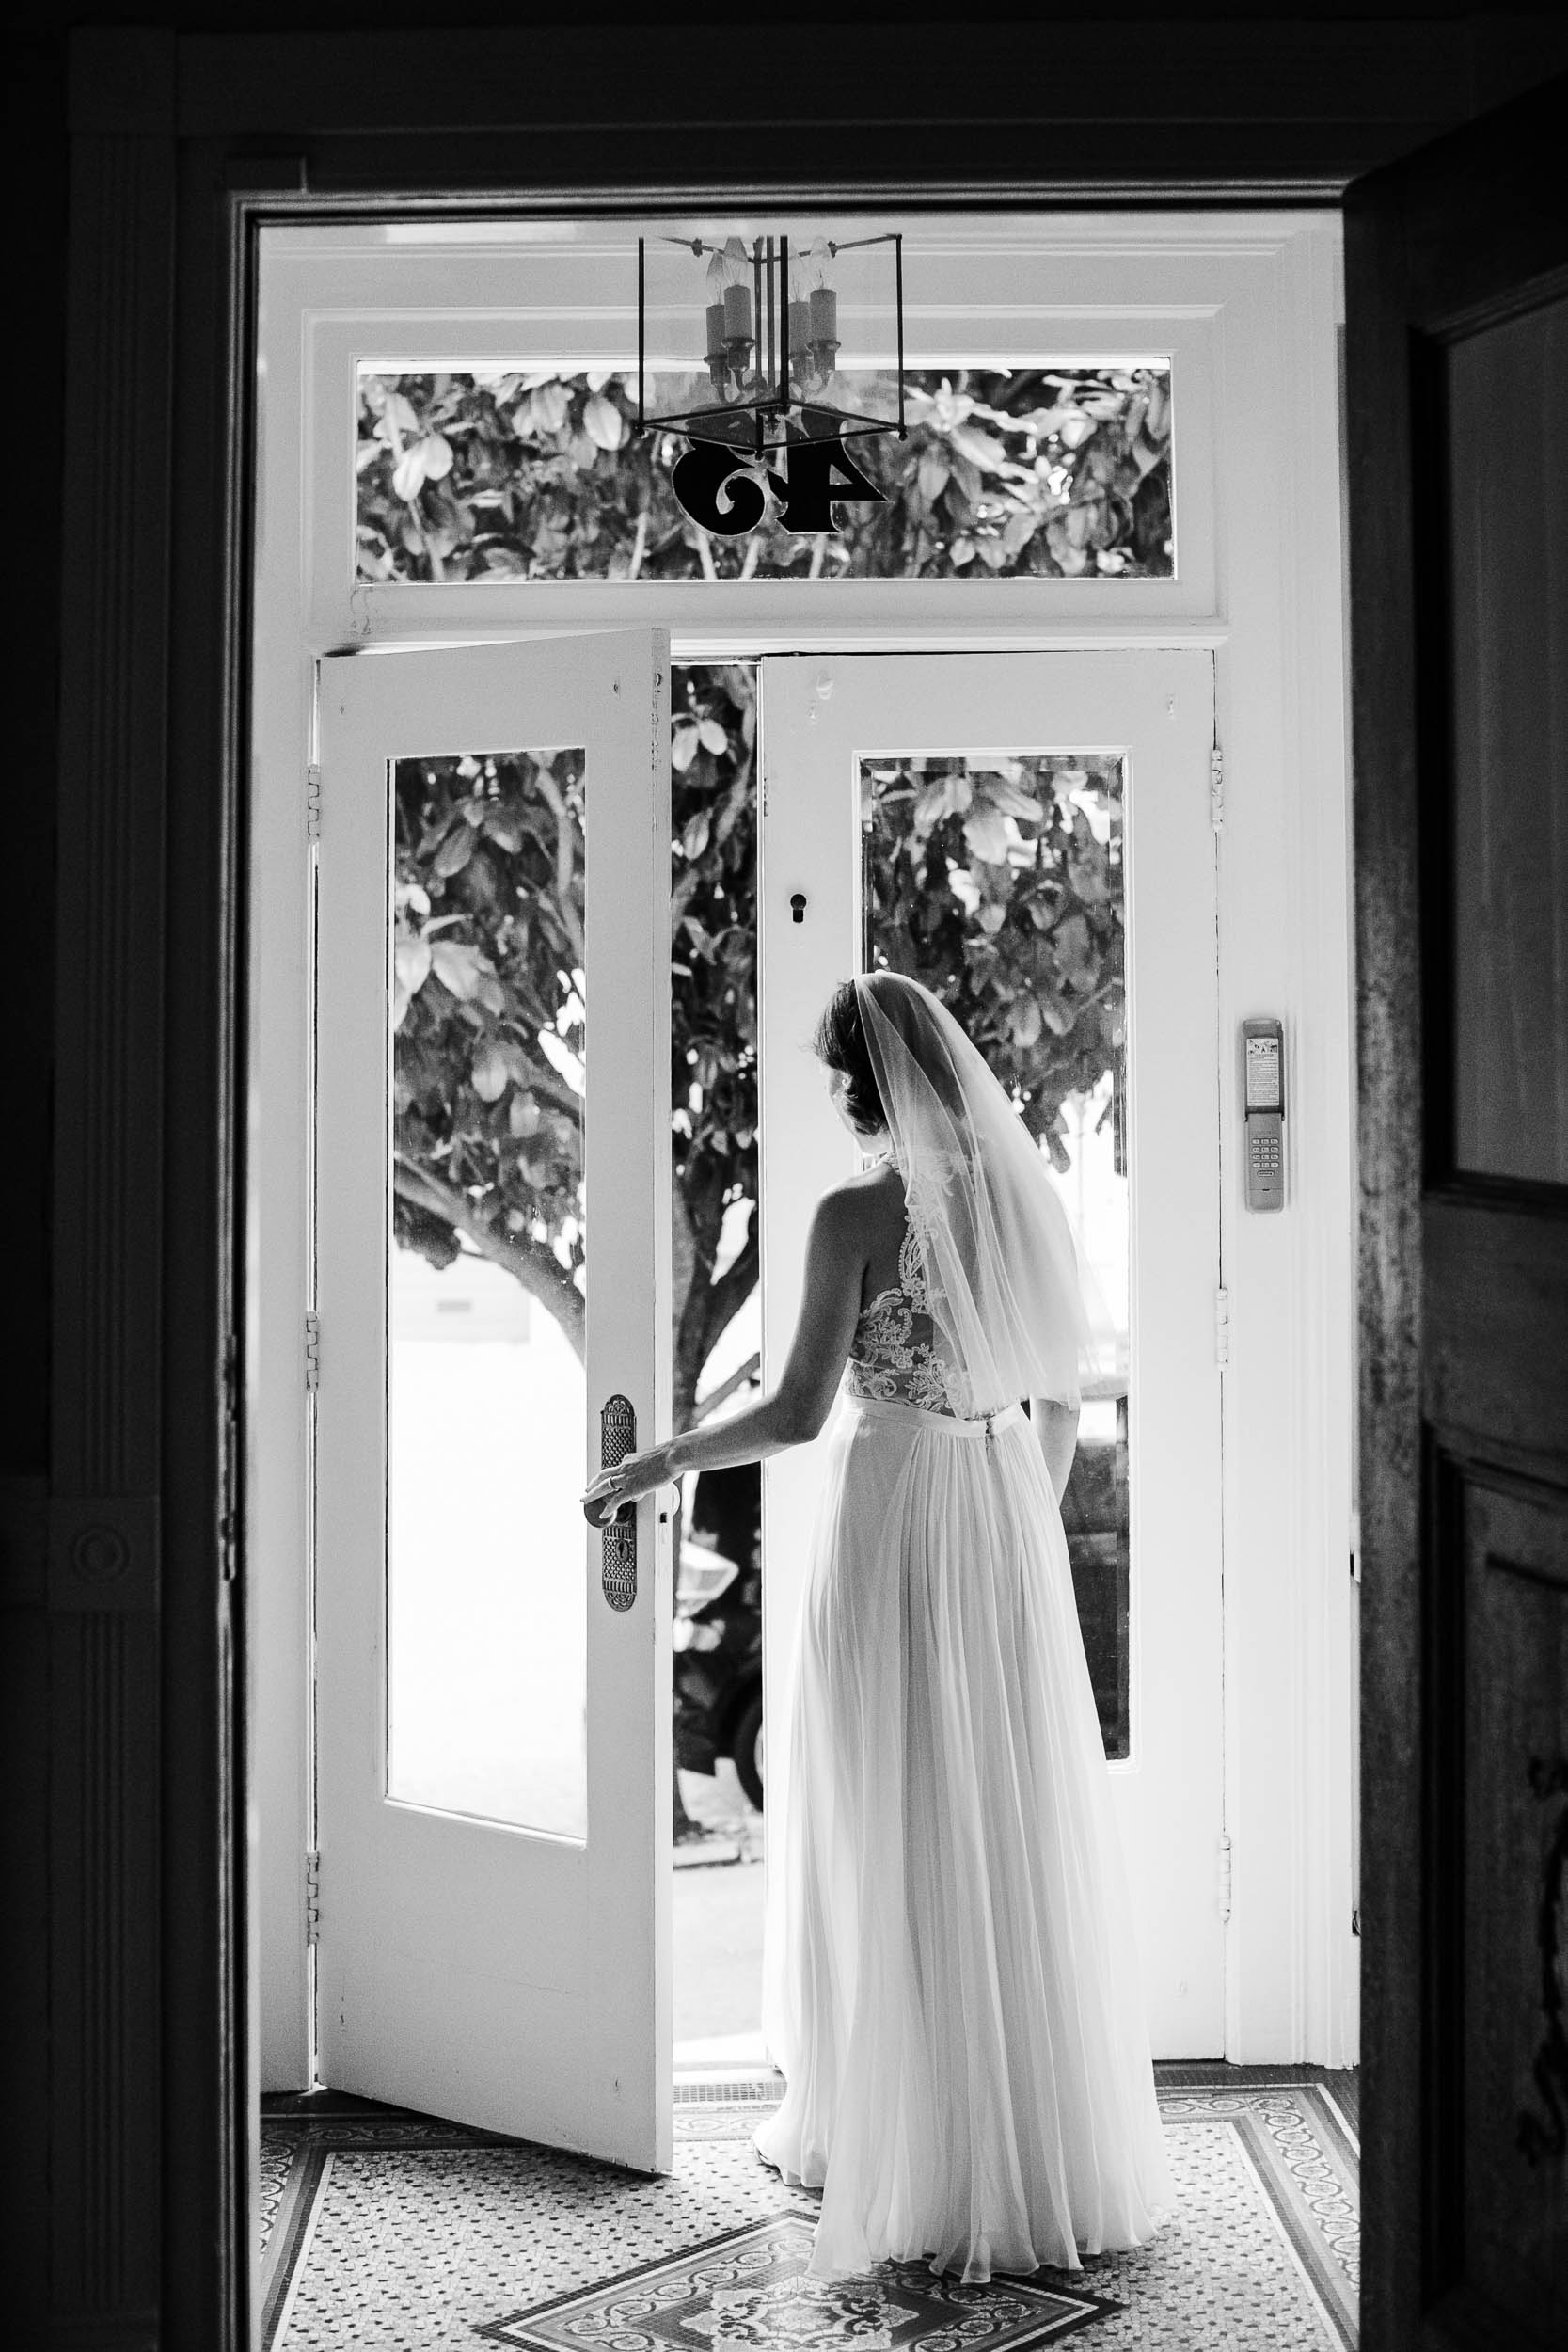 081818_Alina Jason San Francisco Wedding_Buena Lane Photography_2048-2 copy.jpg